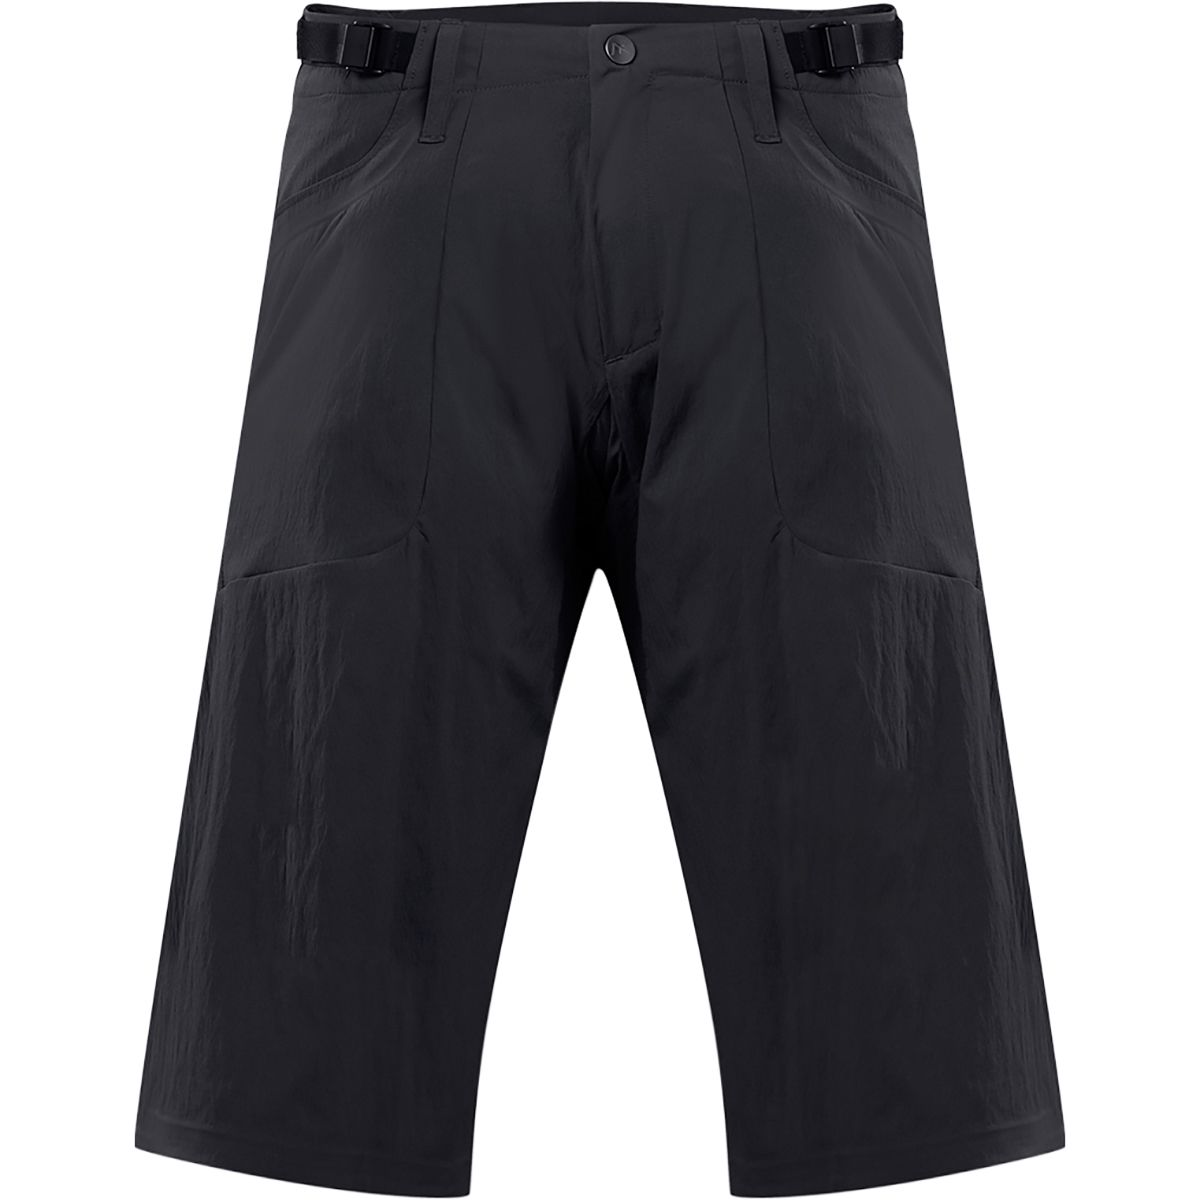 7mesh Industries Glidepath Short Mens